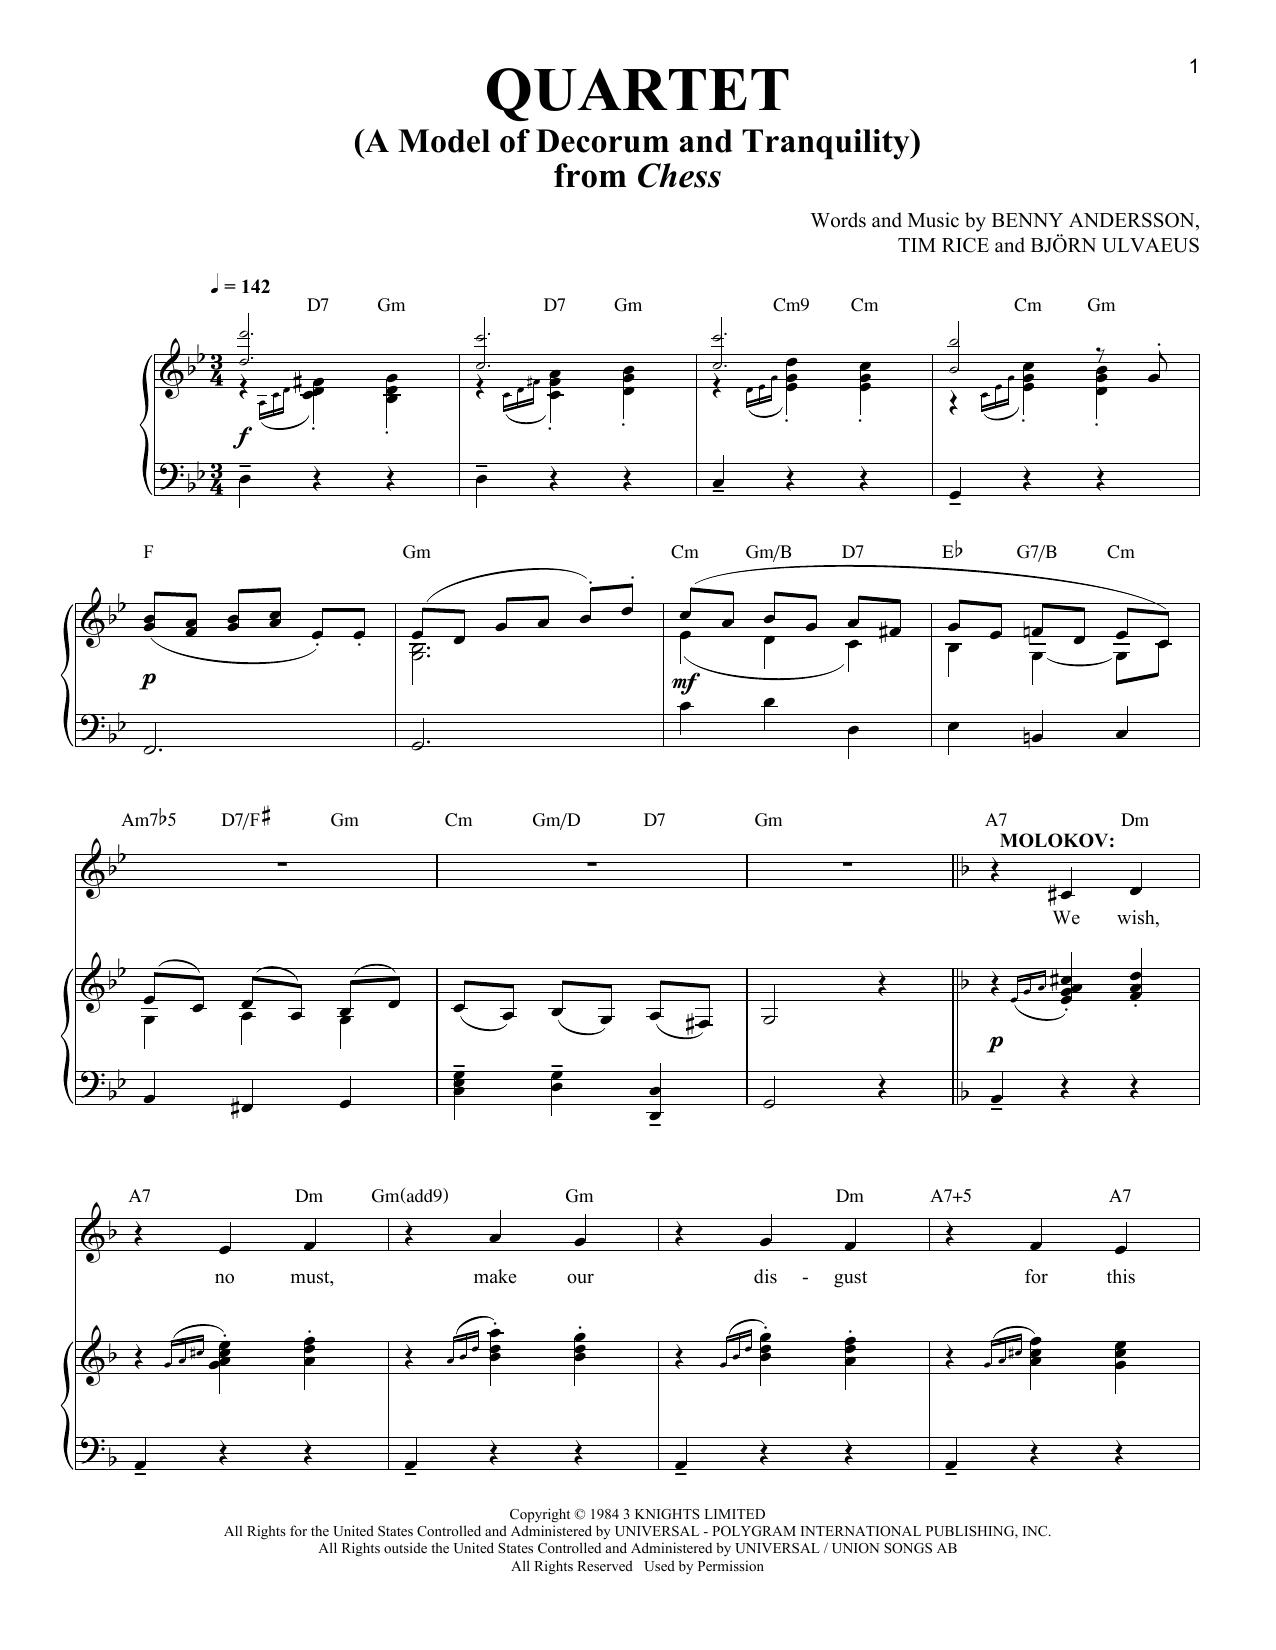 Quartet (A Model Of Decorum and Tranquility) Sheet Music